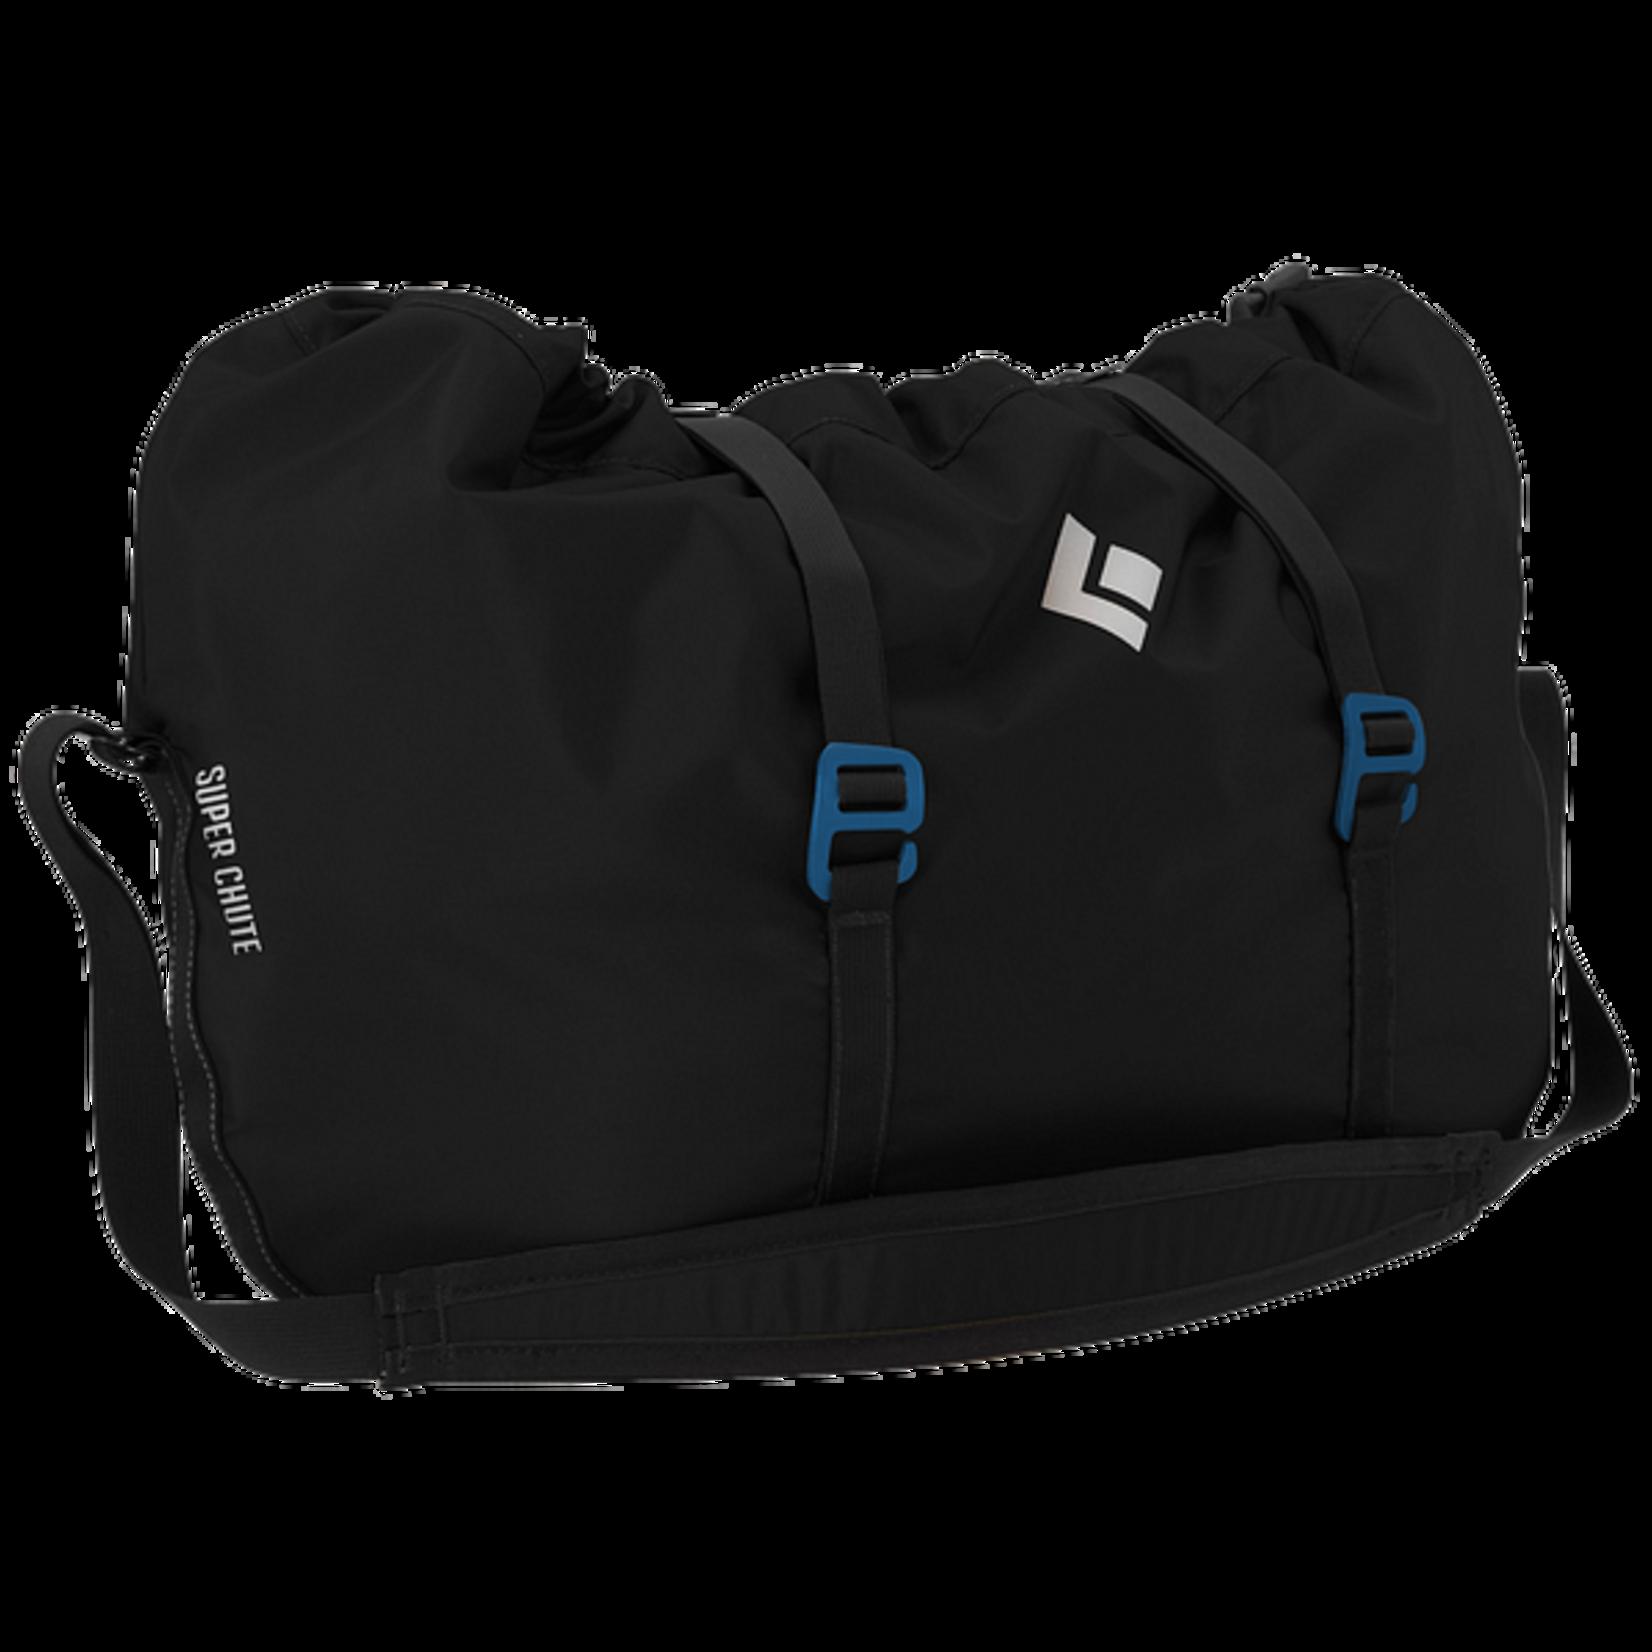 Black Diamond Super Chute Rope Bag